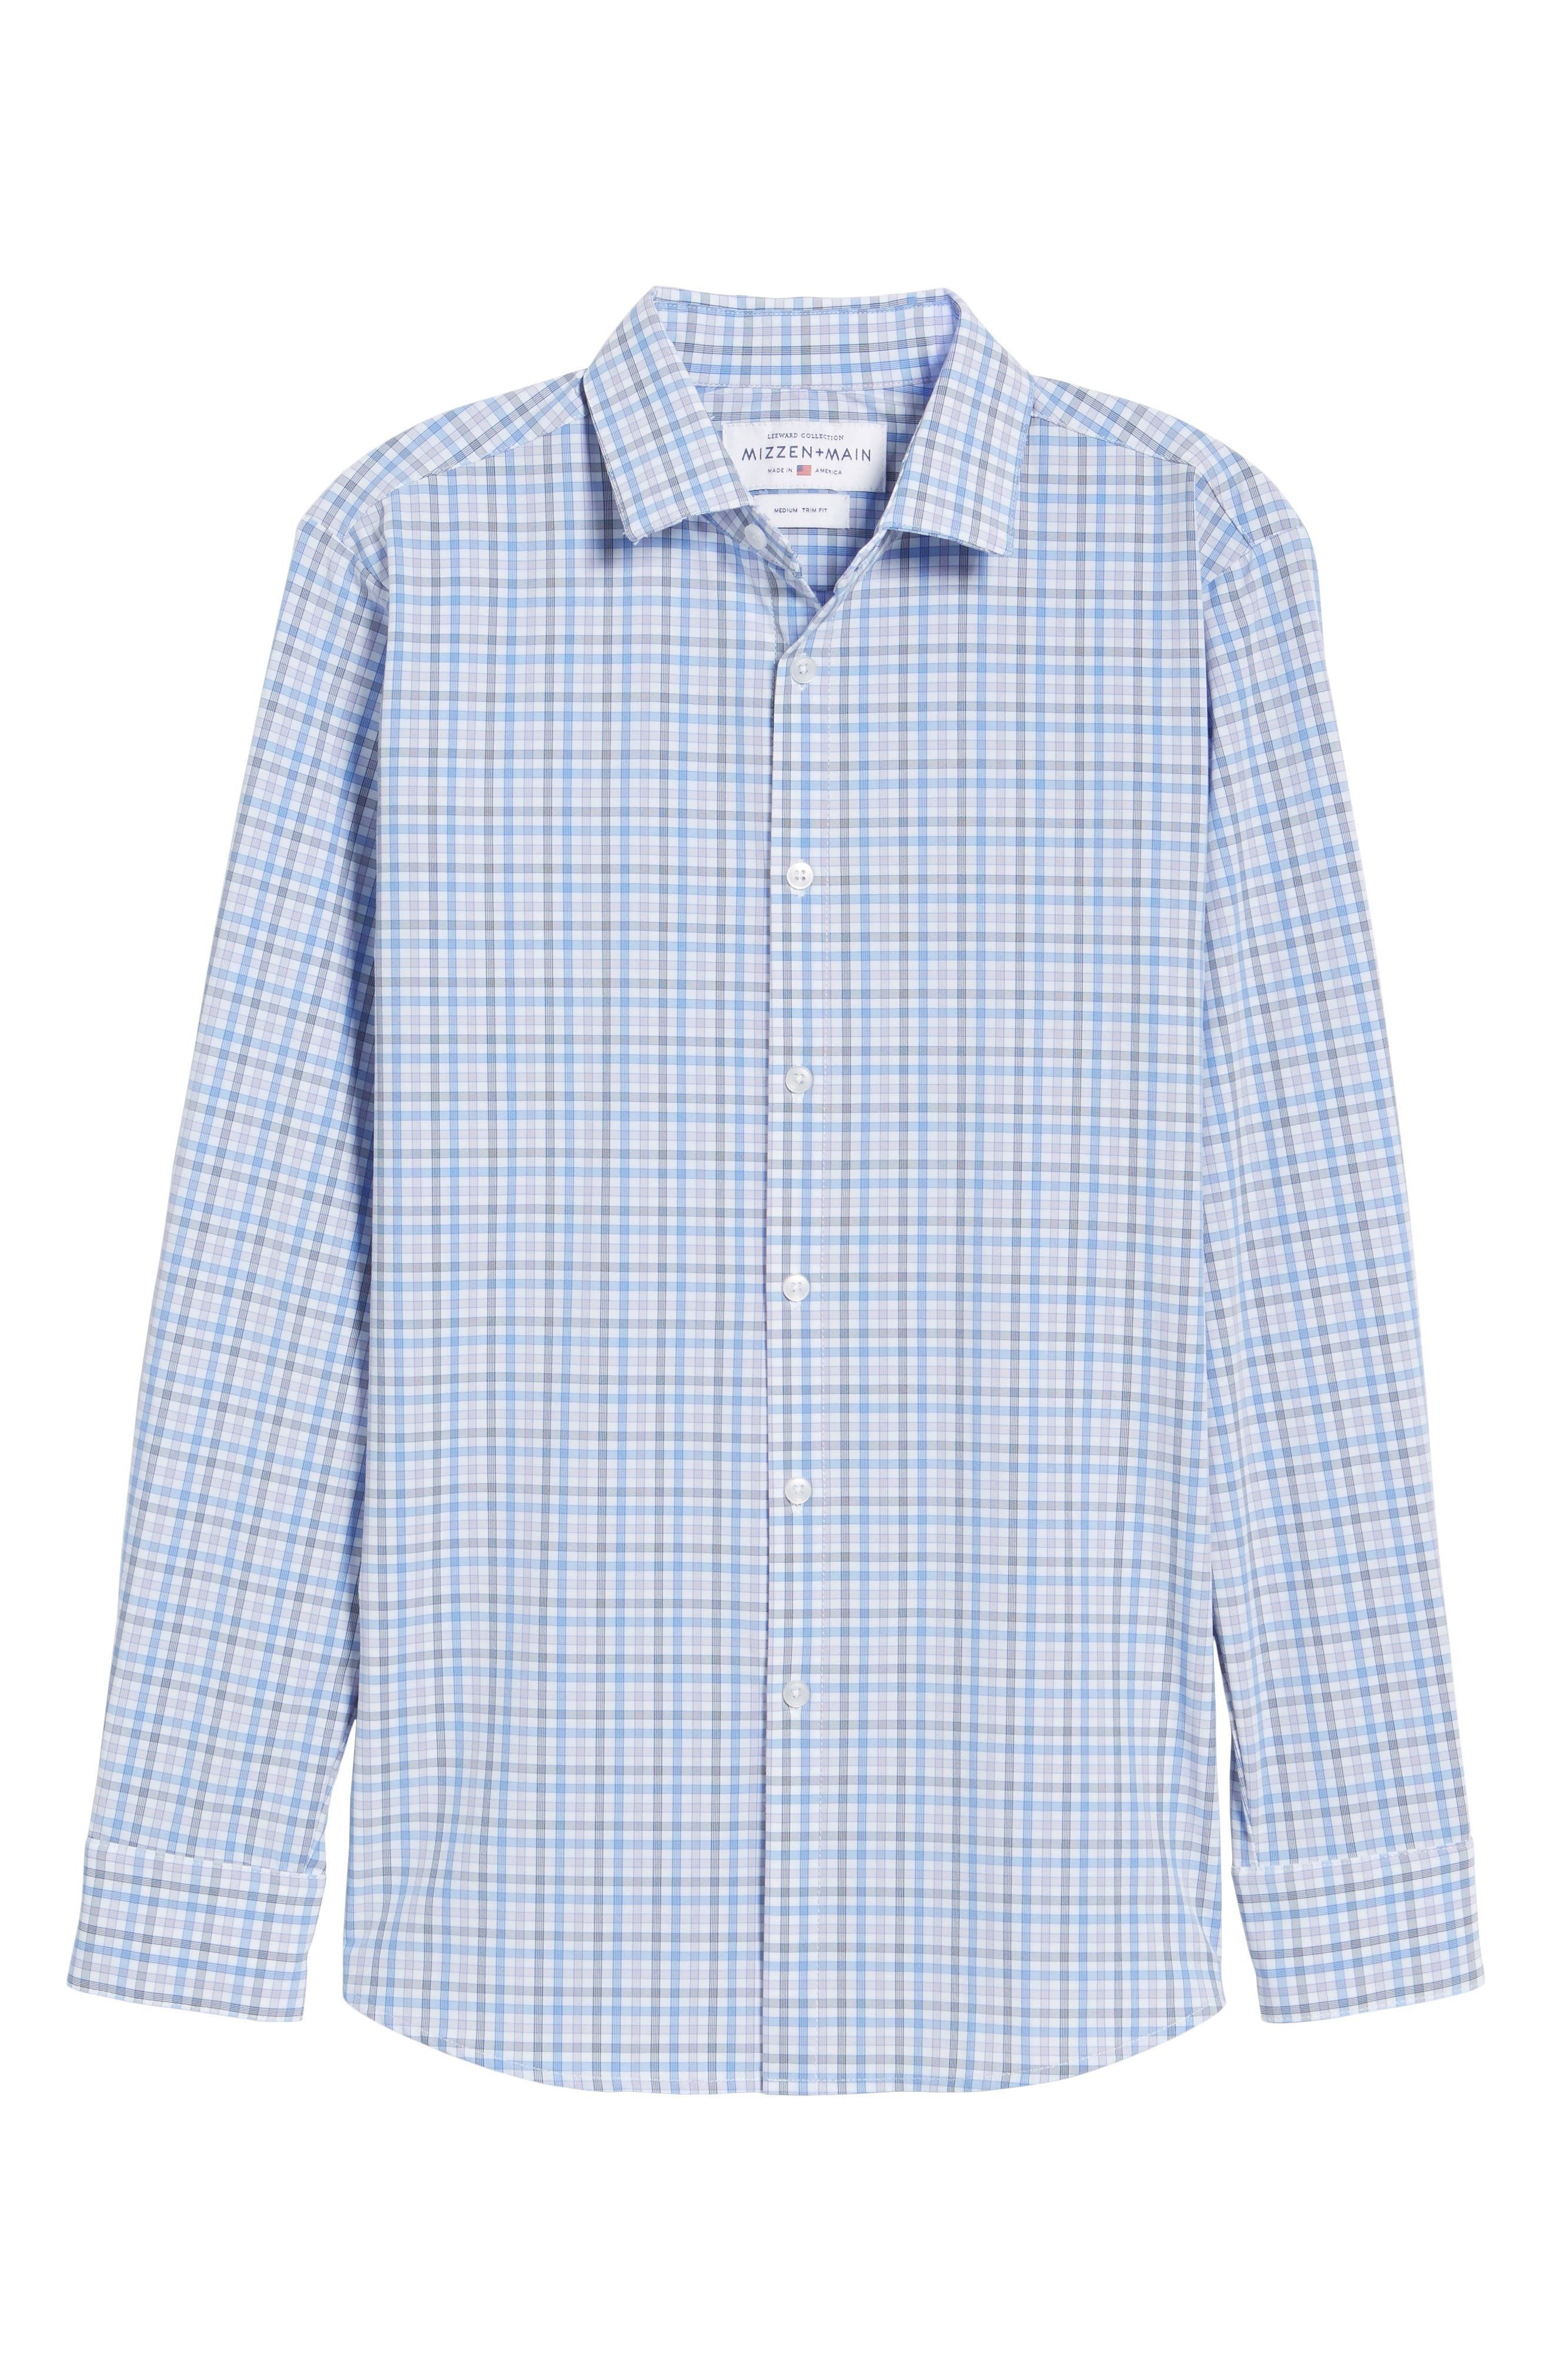 Donley Tattersall Sport Shirt,                             Alternate thumbnail 6, color,                             BLUE